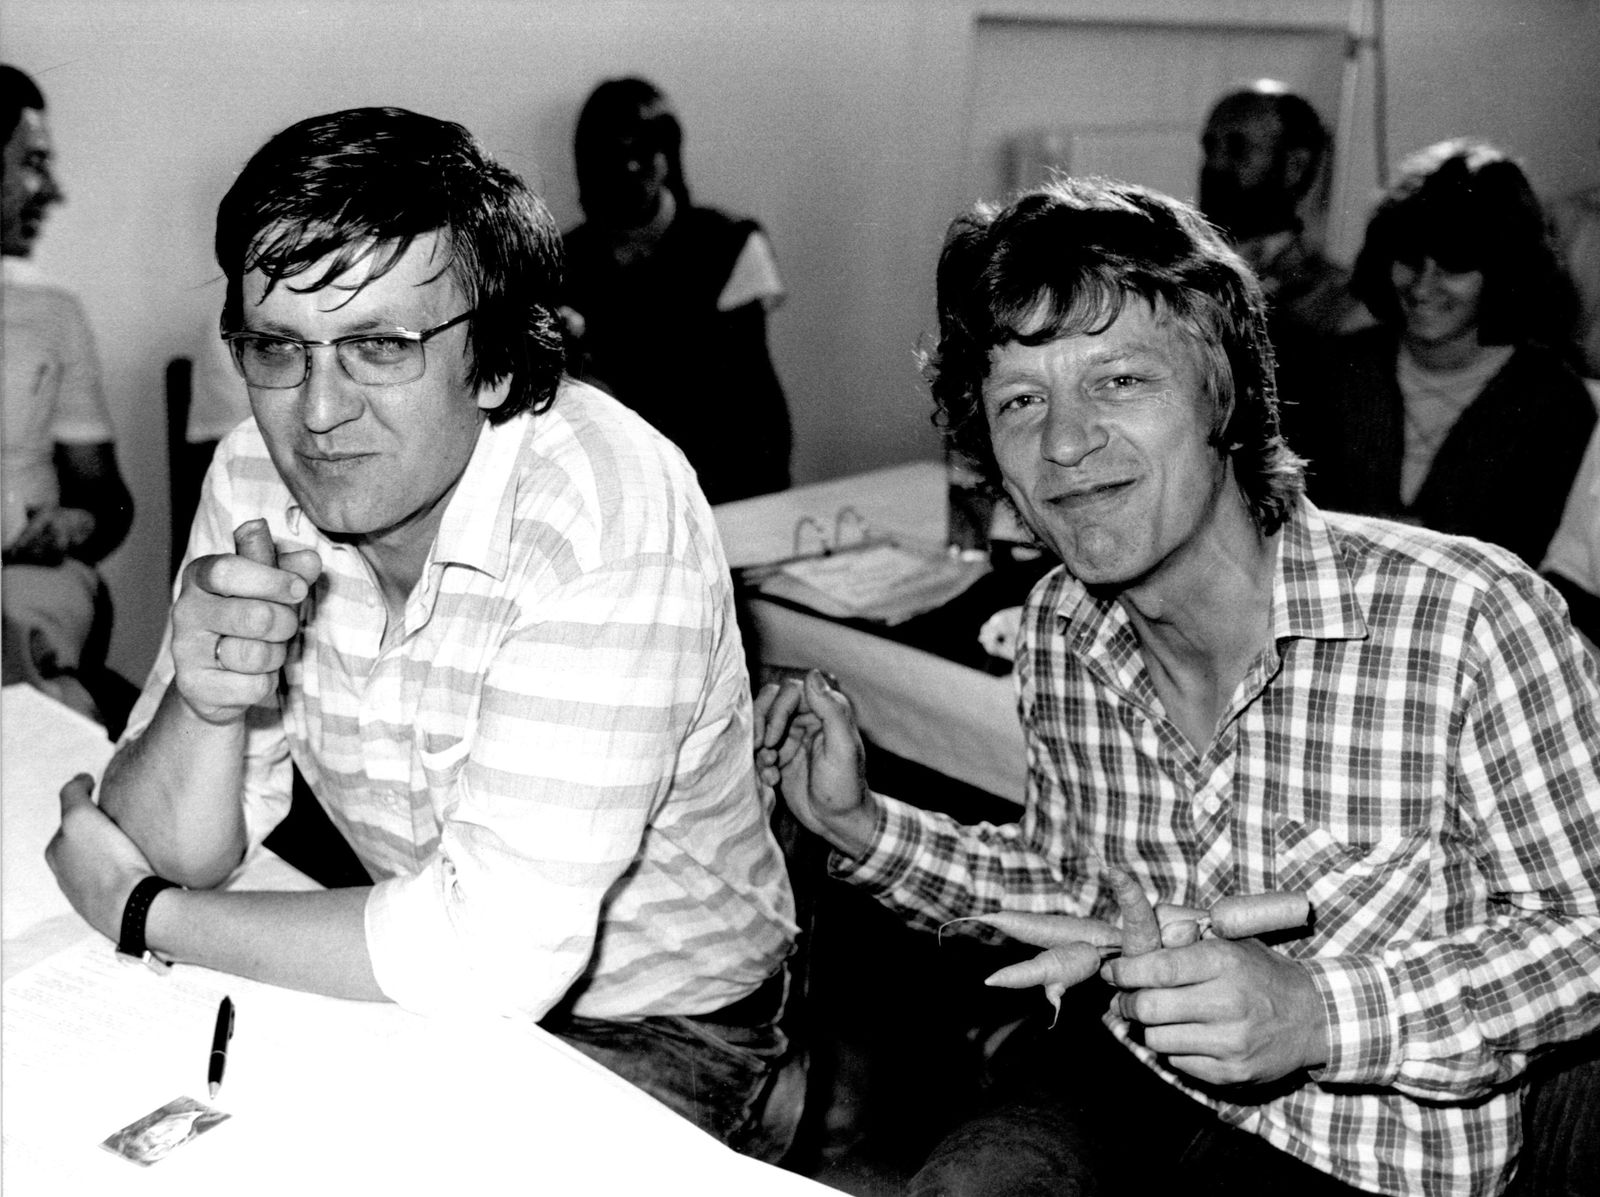 Wolf-Dieter Hasenclever und Winfried Kretschmann